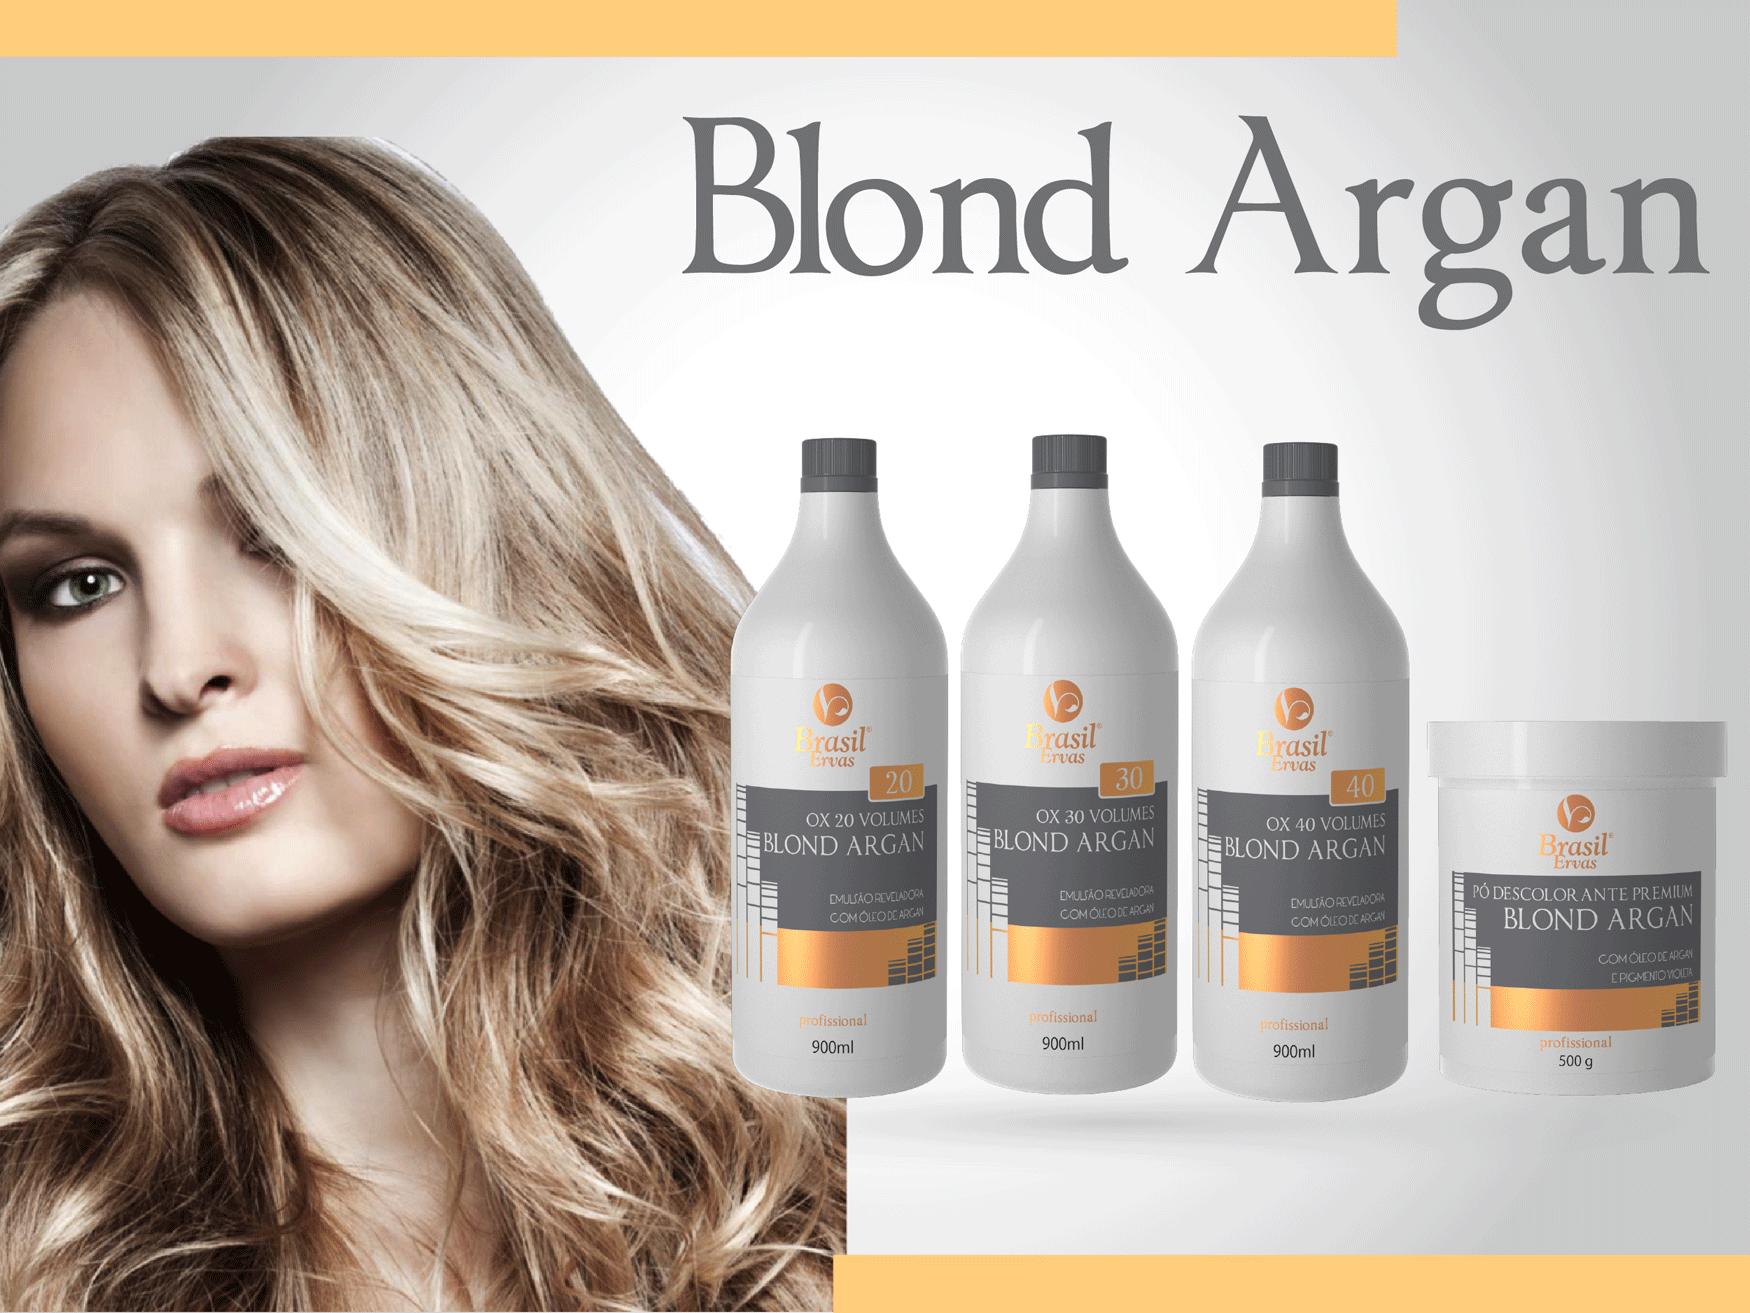 blond-argan-linha